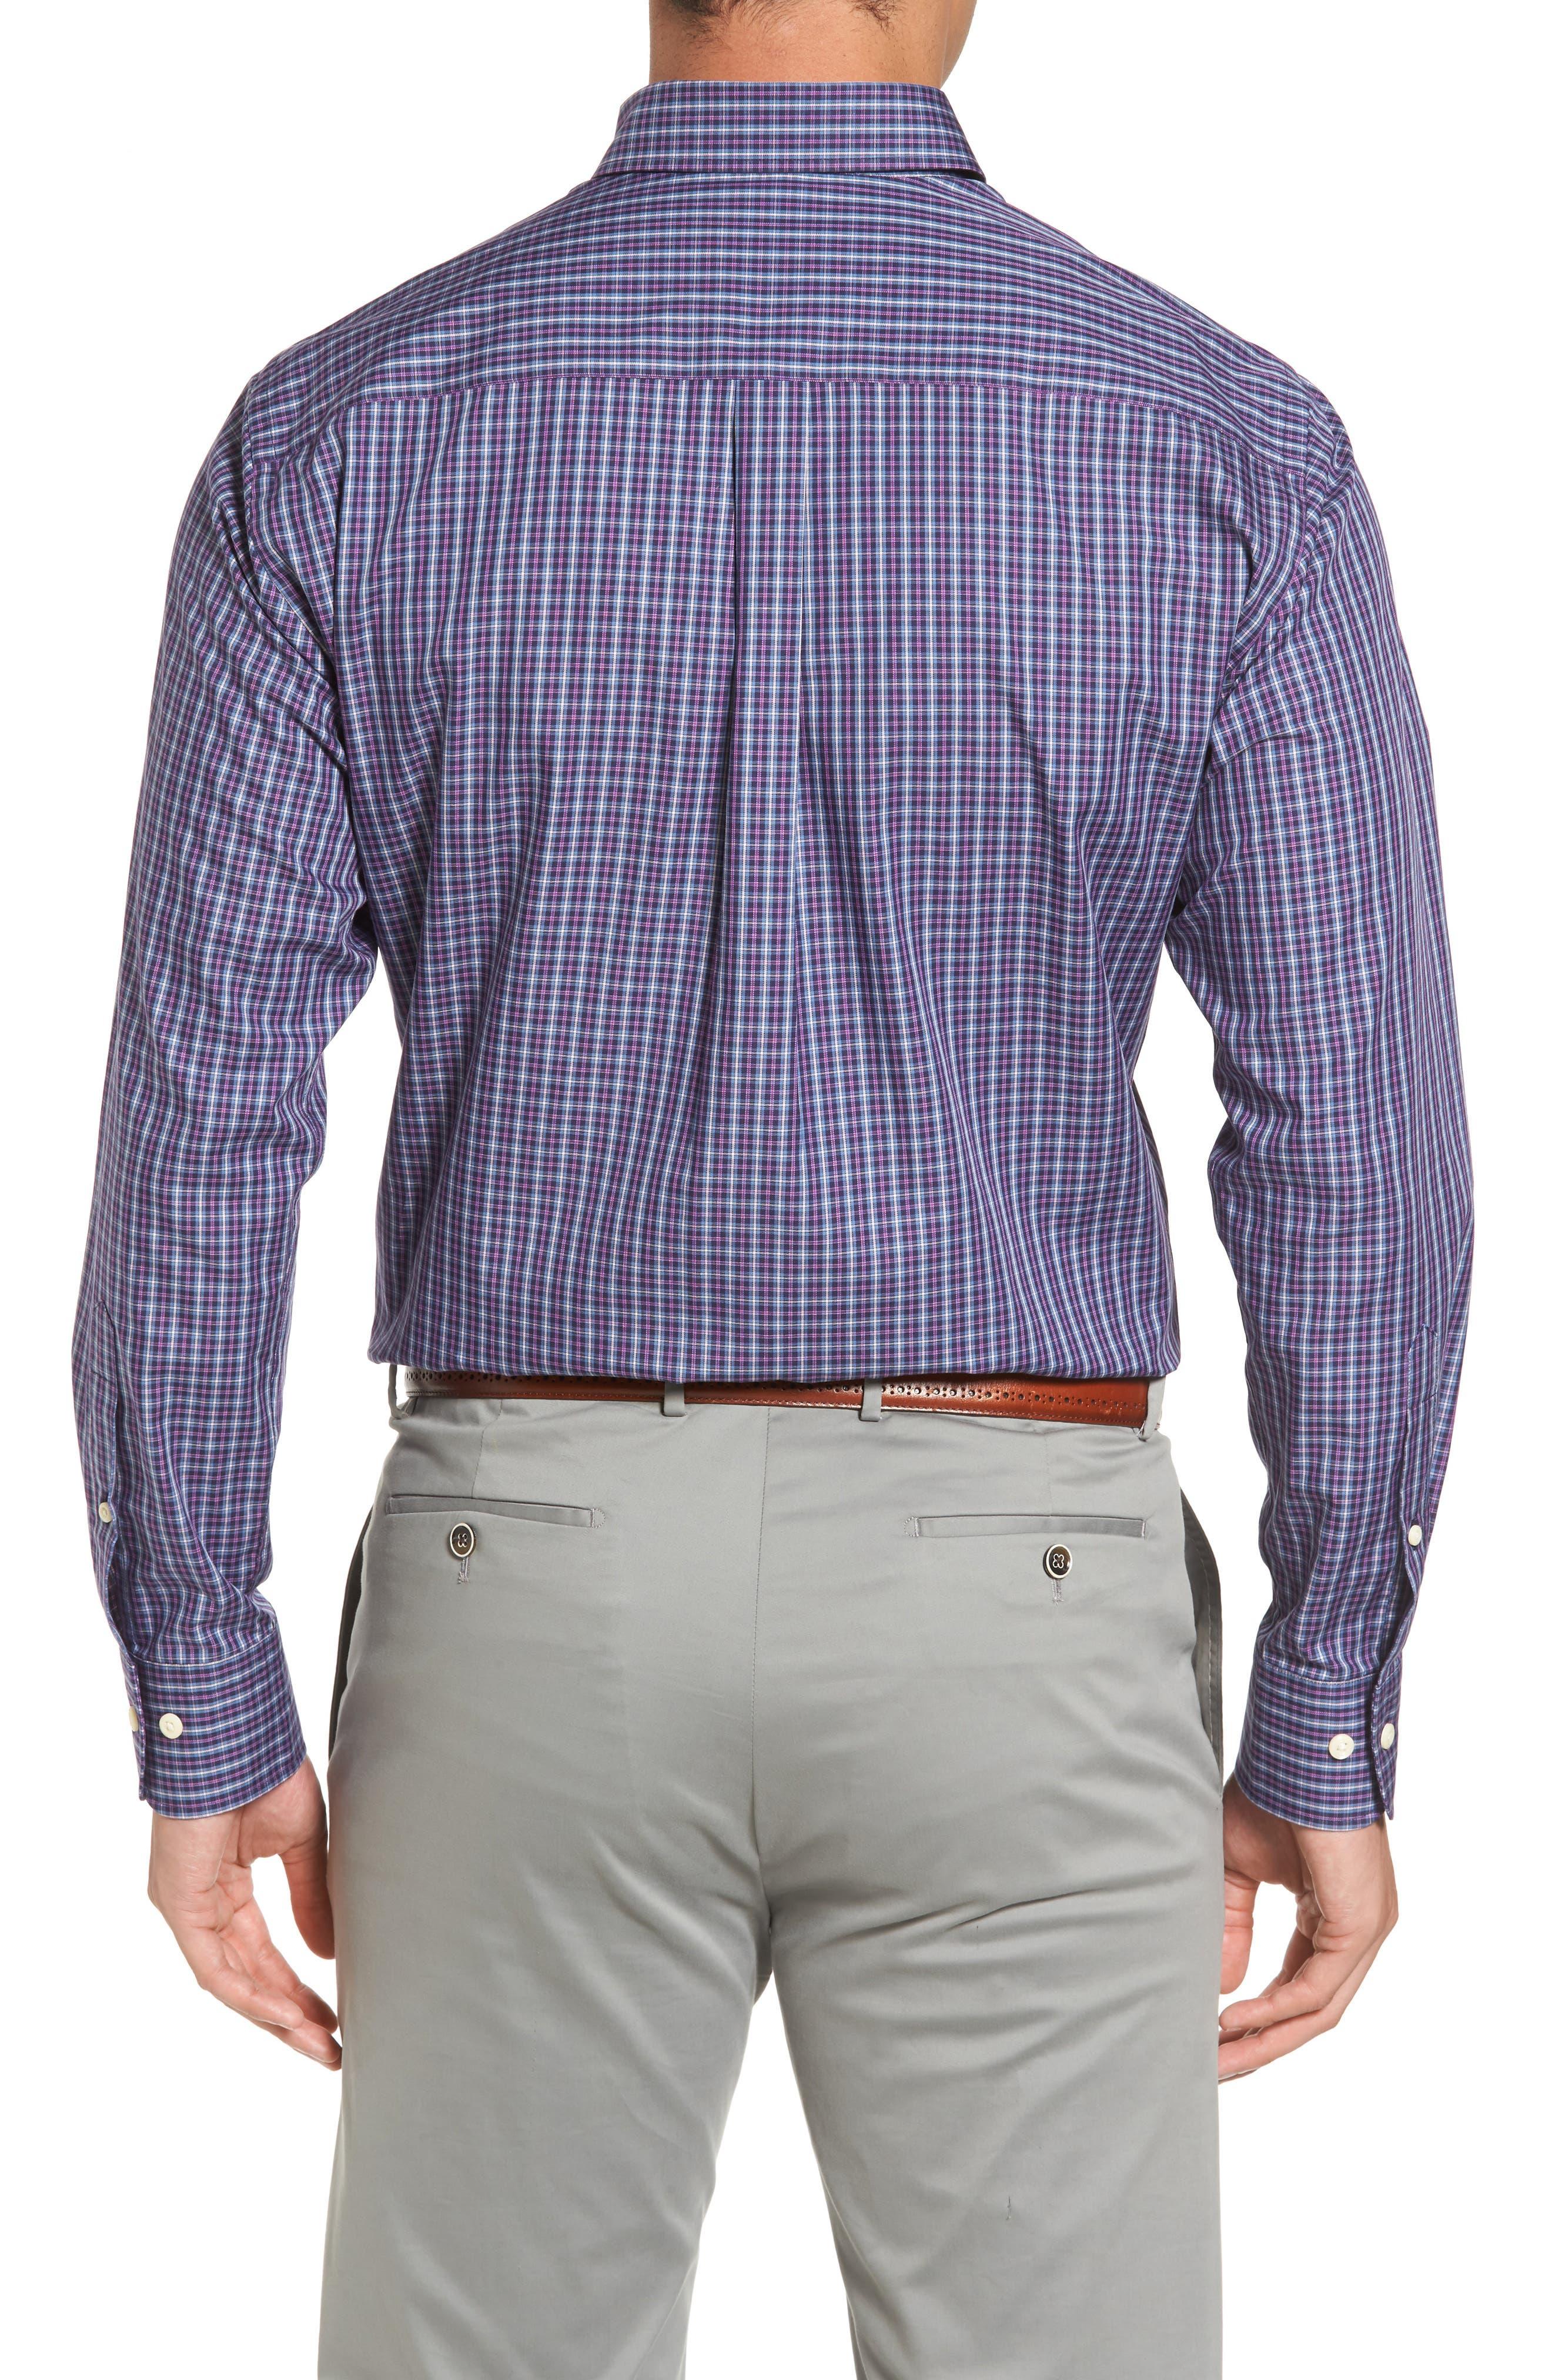 Hillock Regular Fit Plaid Sport Shirt,                             Alternate thumbnail 2, color,